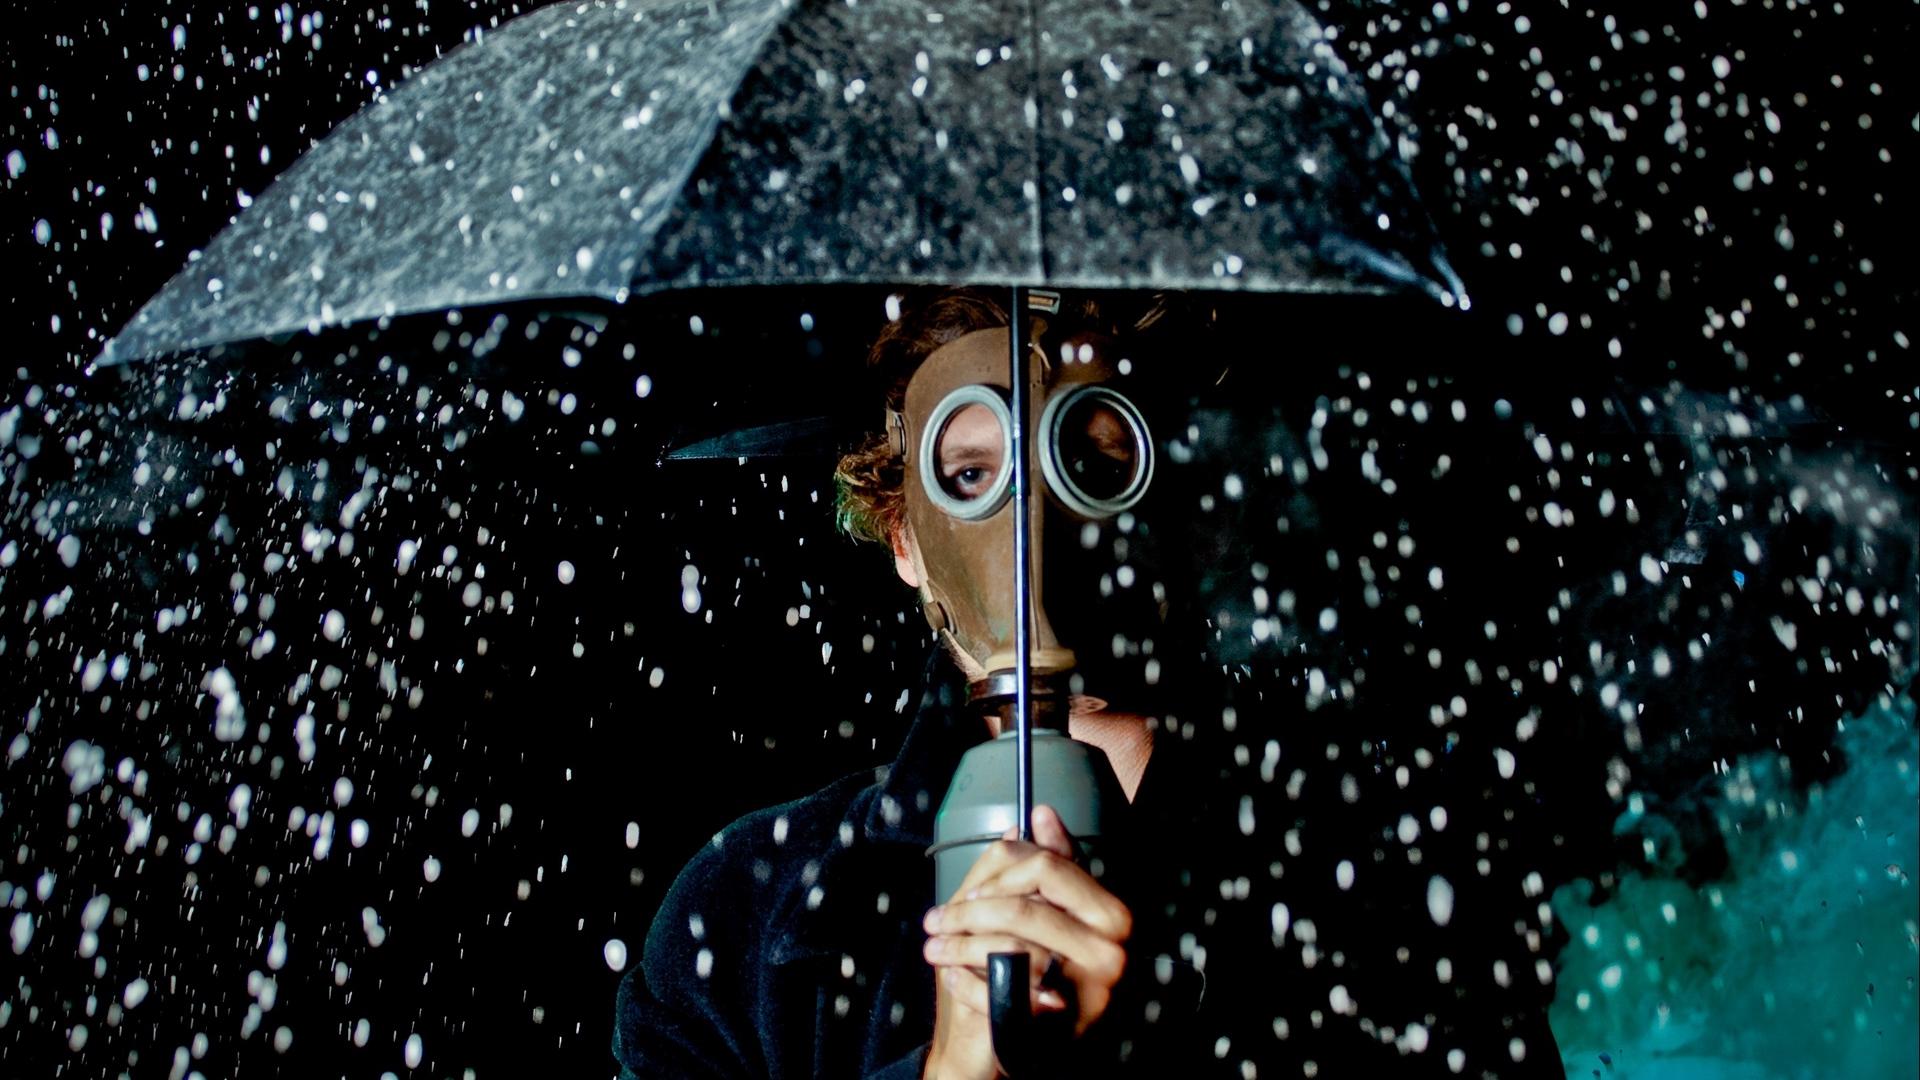 rain gas masks umbrella